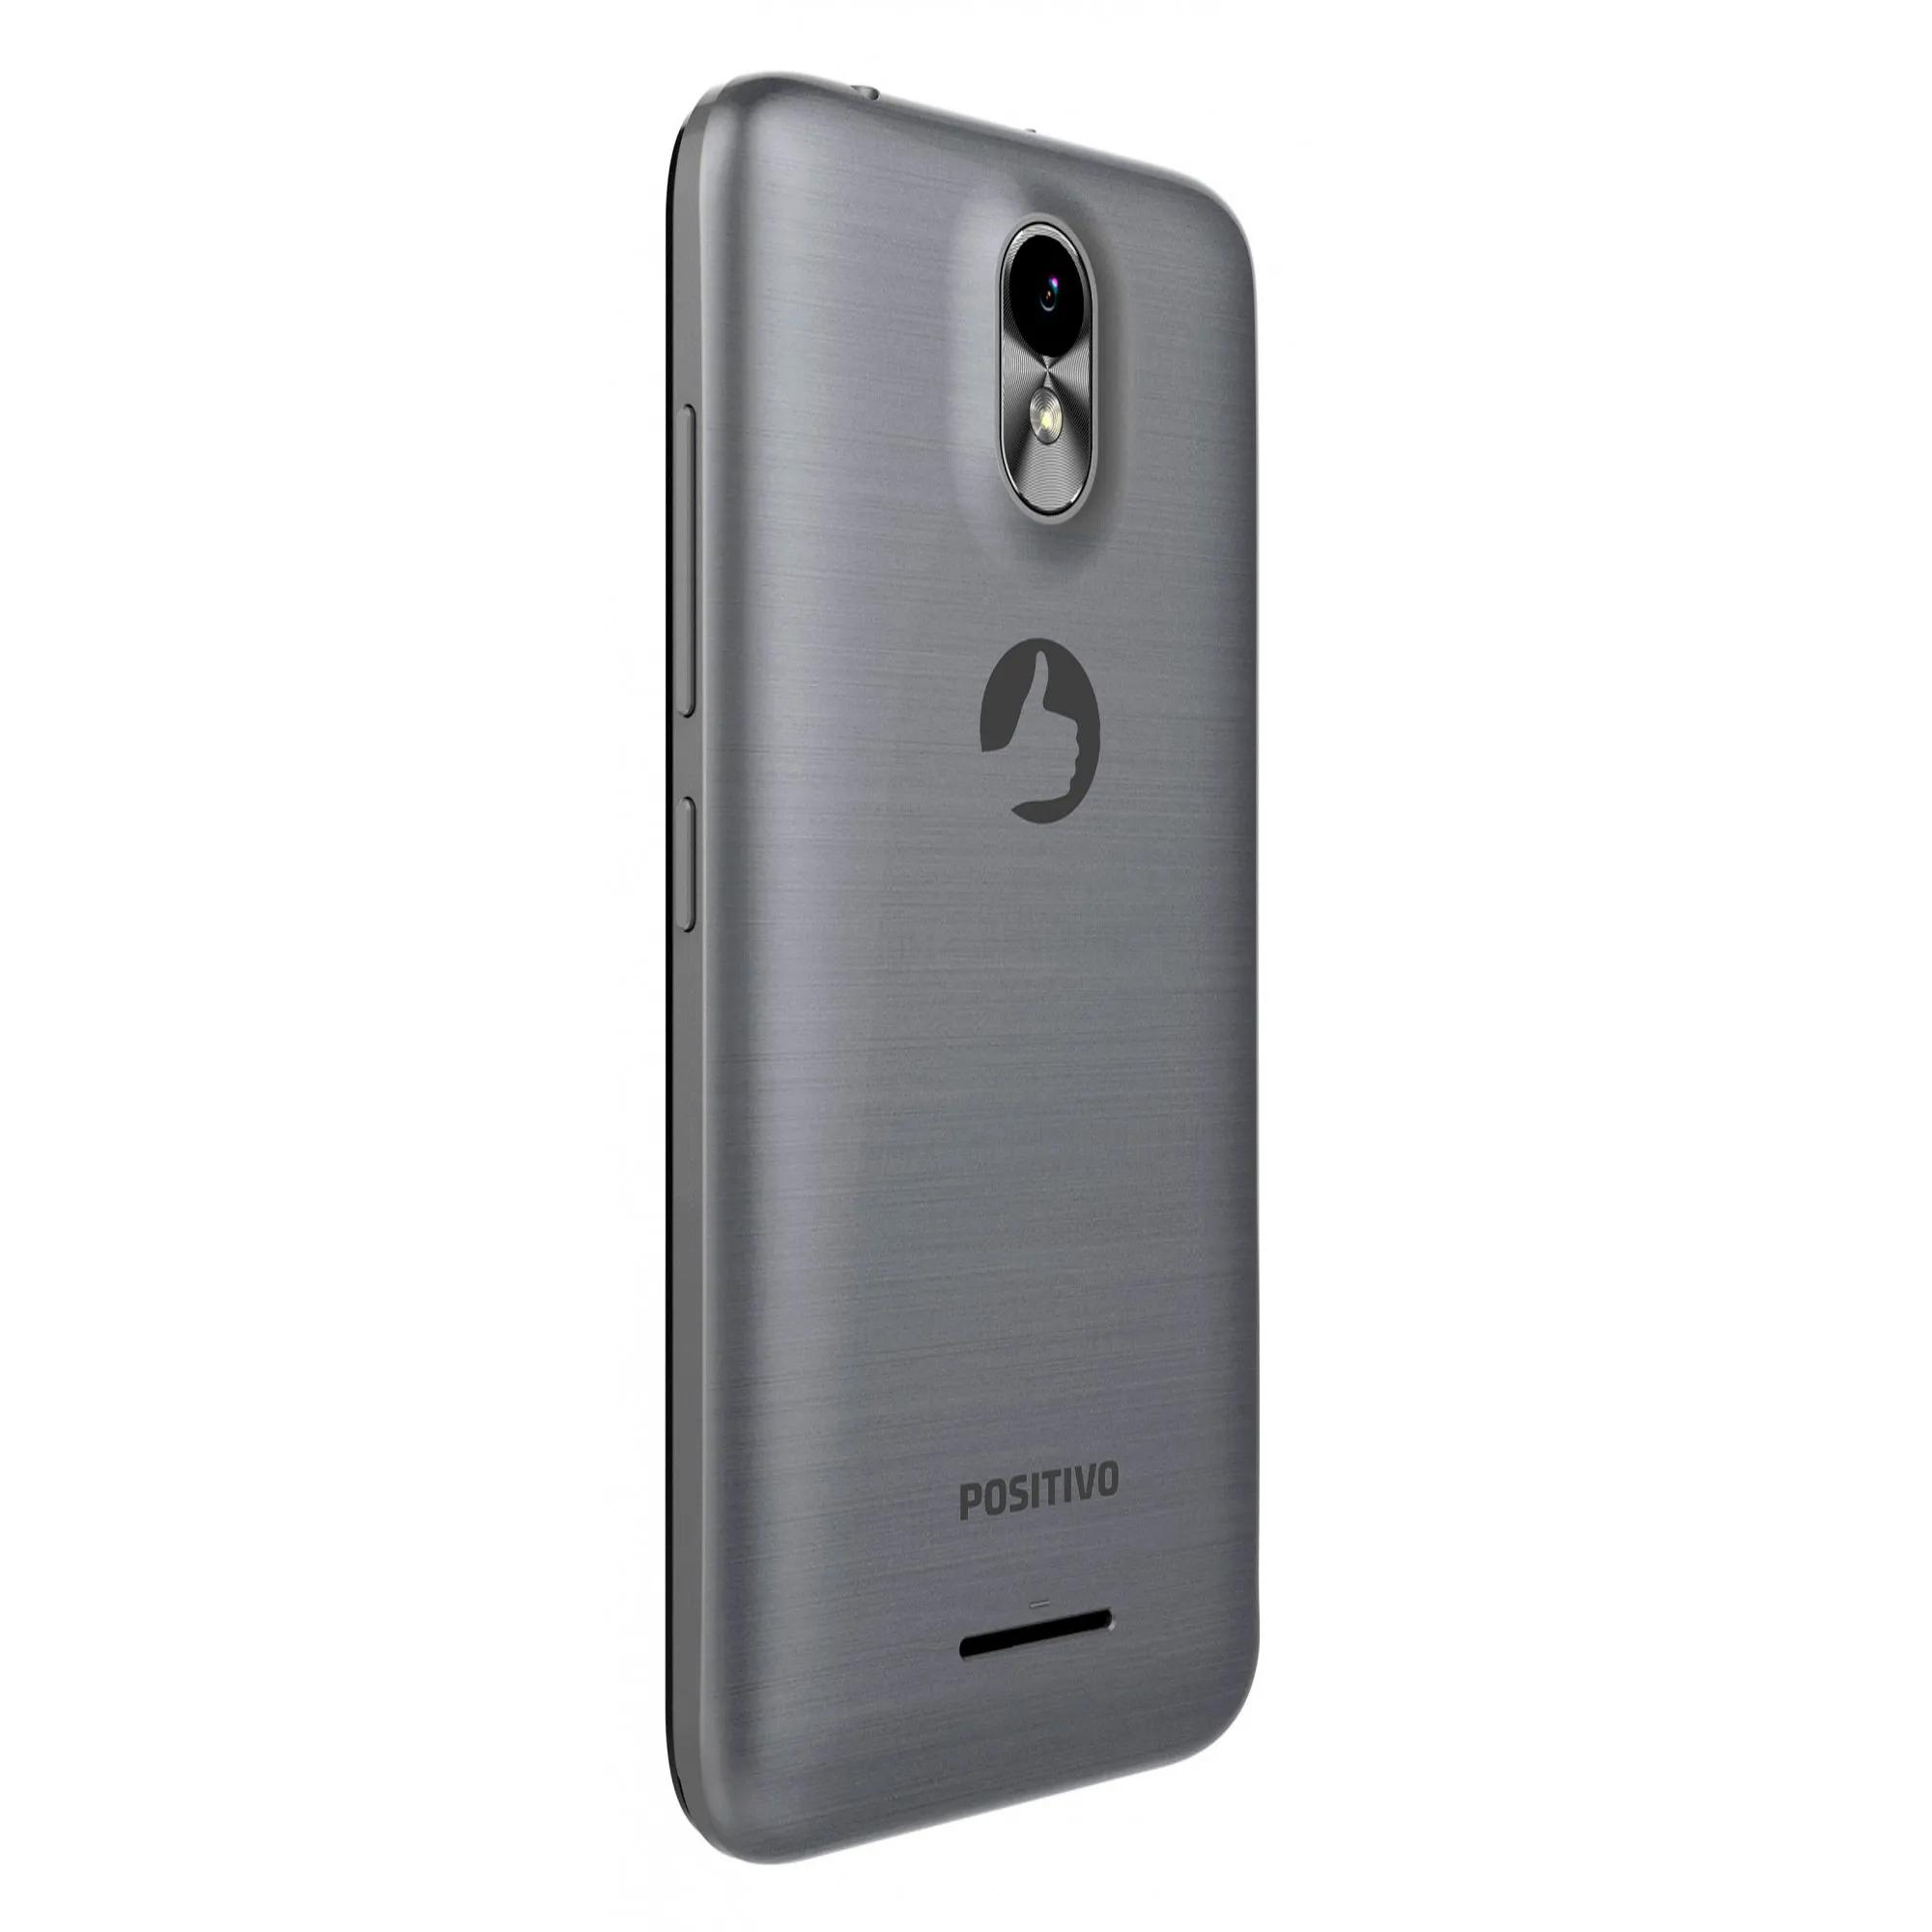 Smartphone Positivo Twist 3 Mini S431b 16gb Grafite